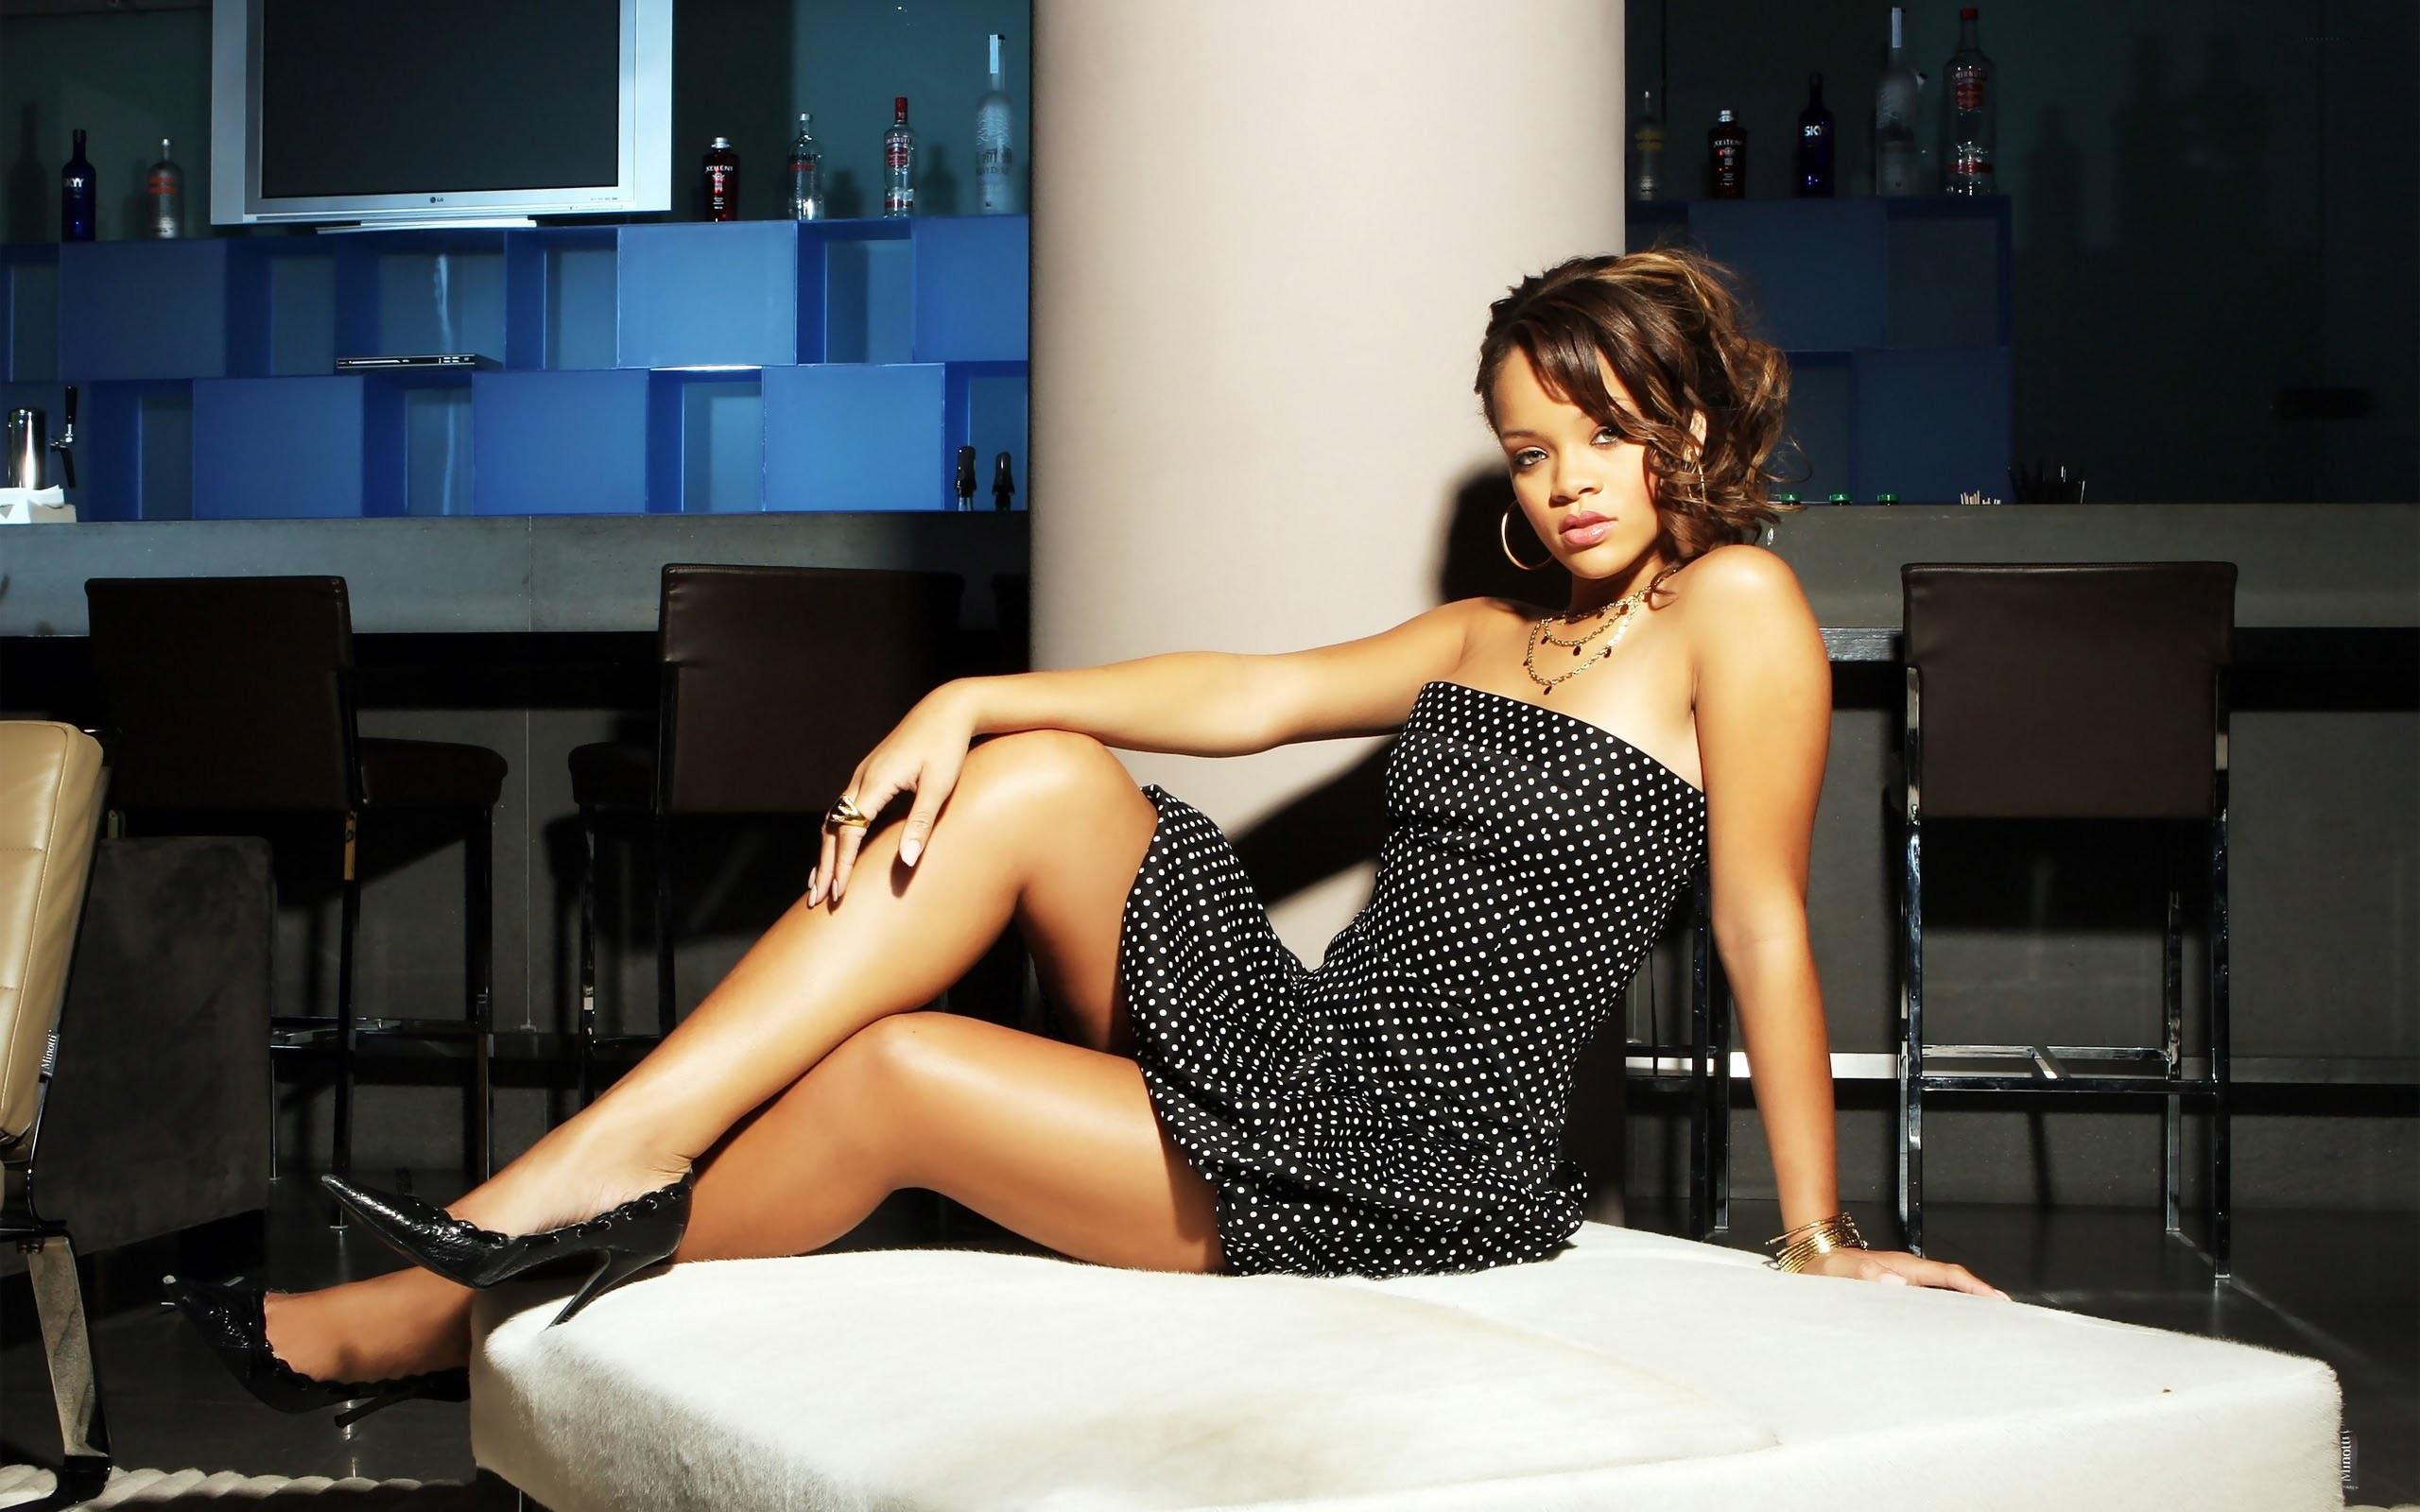 Hot Rihanna 2015 HD Wallpaper   New HD Wallpapers 2560x1600